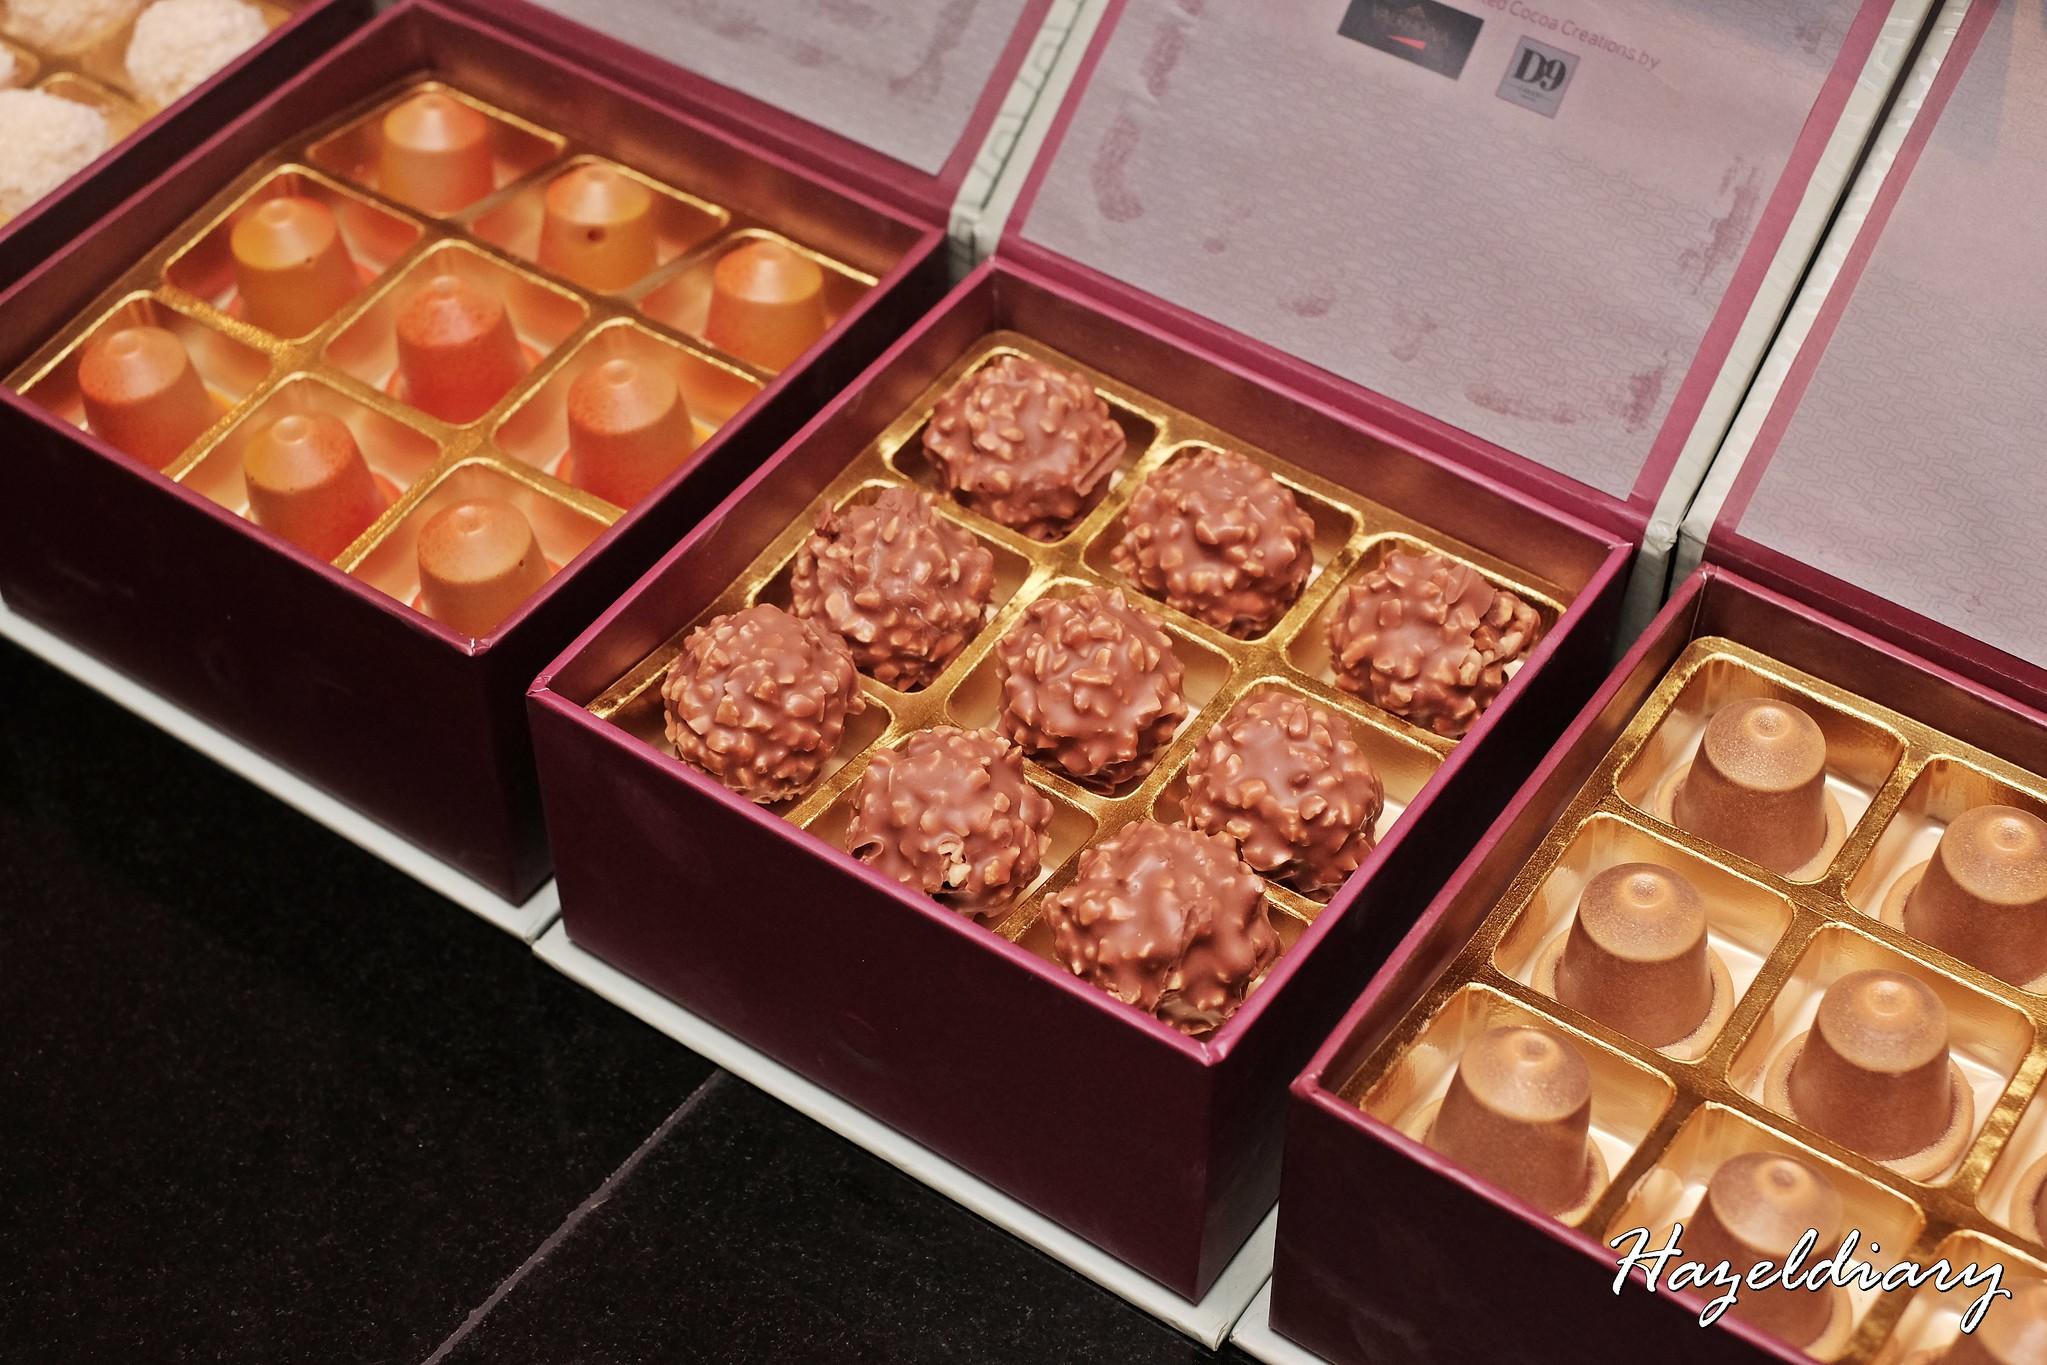 D9 Cakery of Hilton Singapore- Valrhona bonbon creations